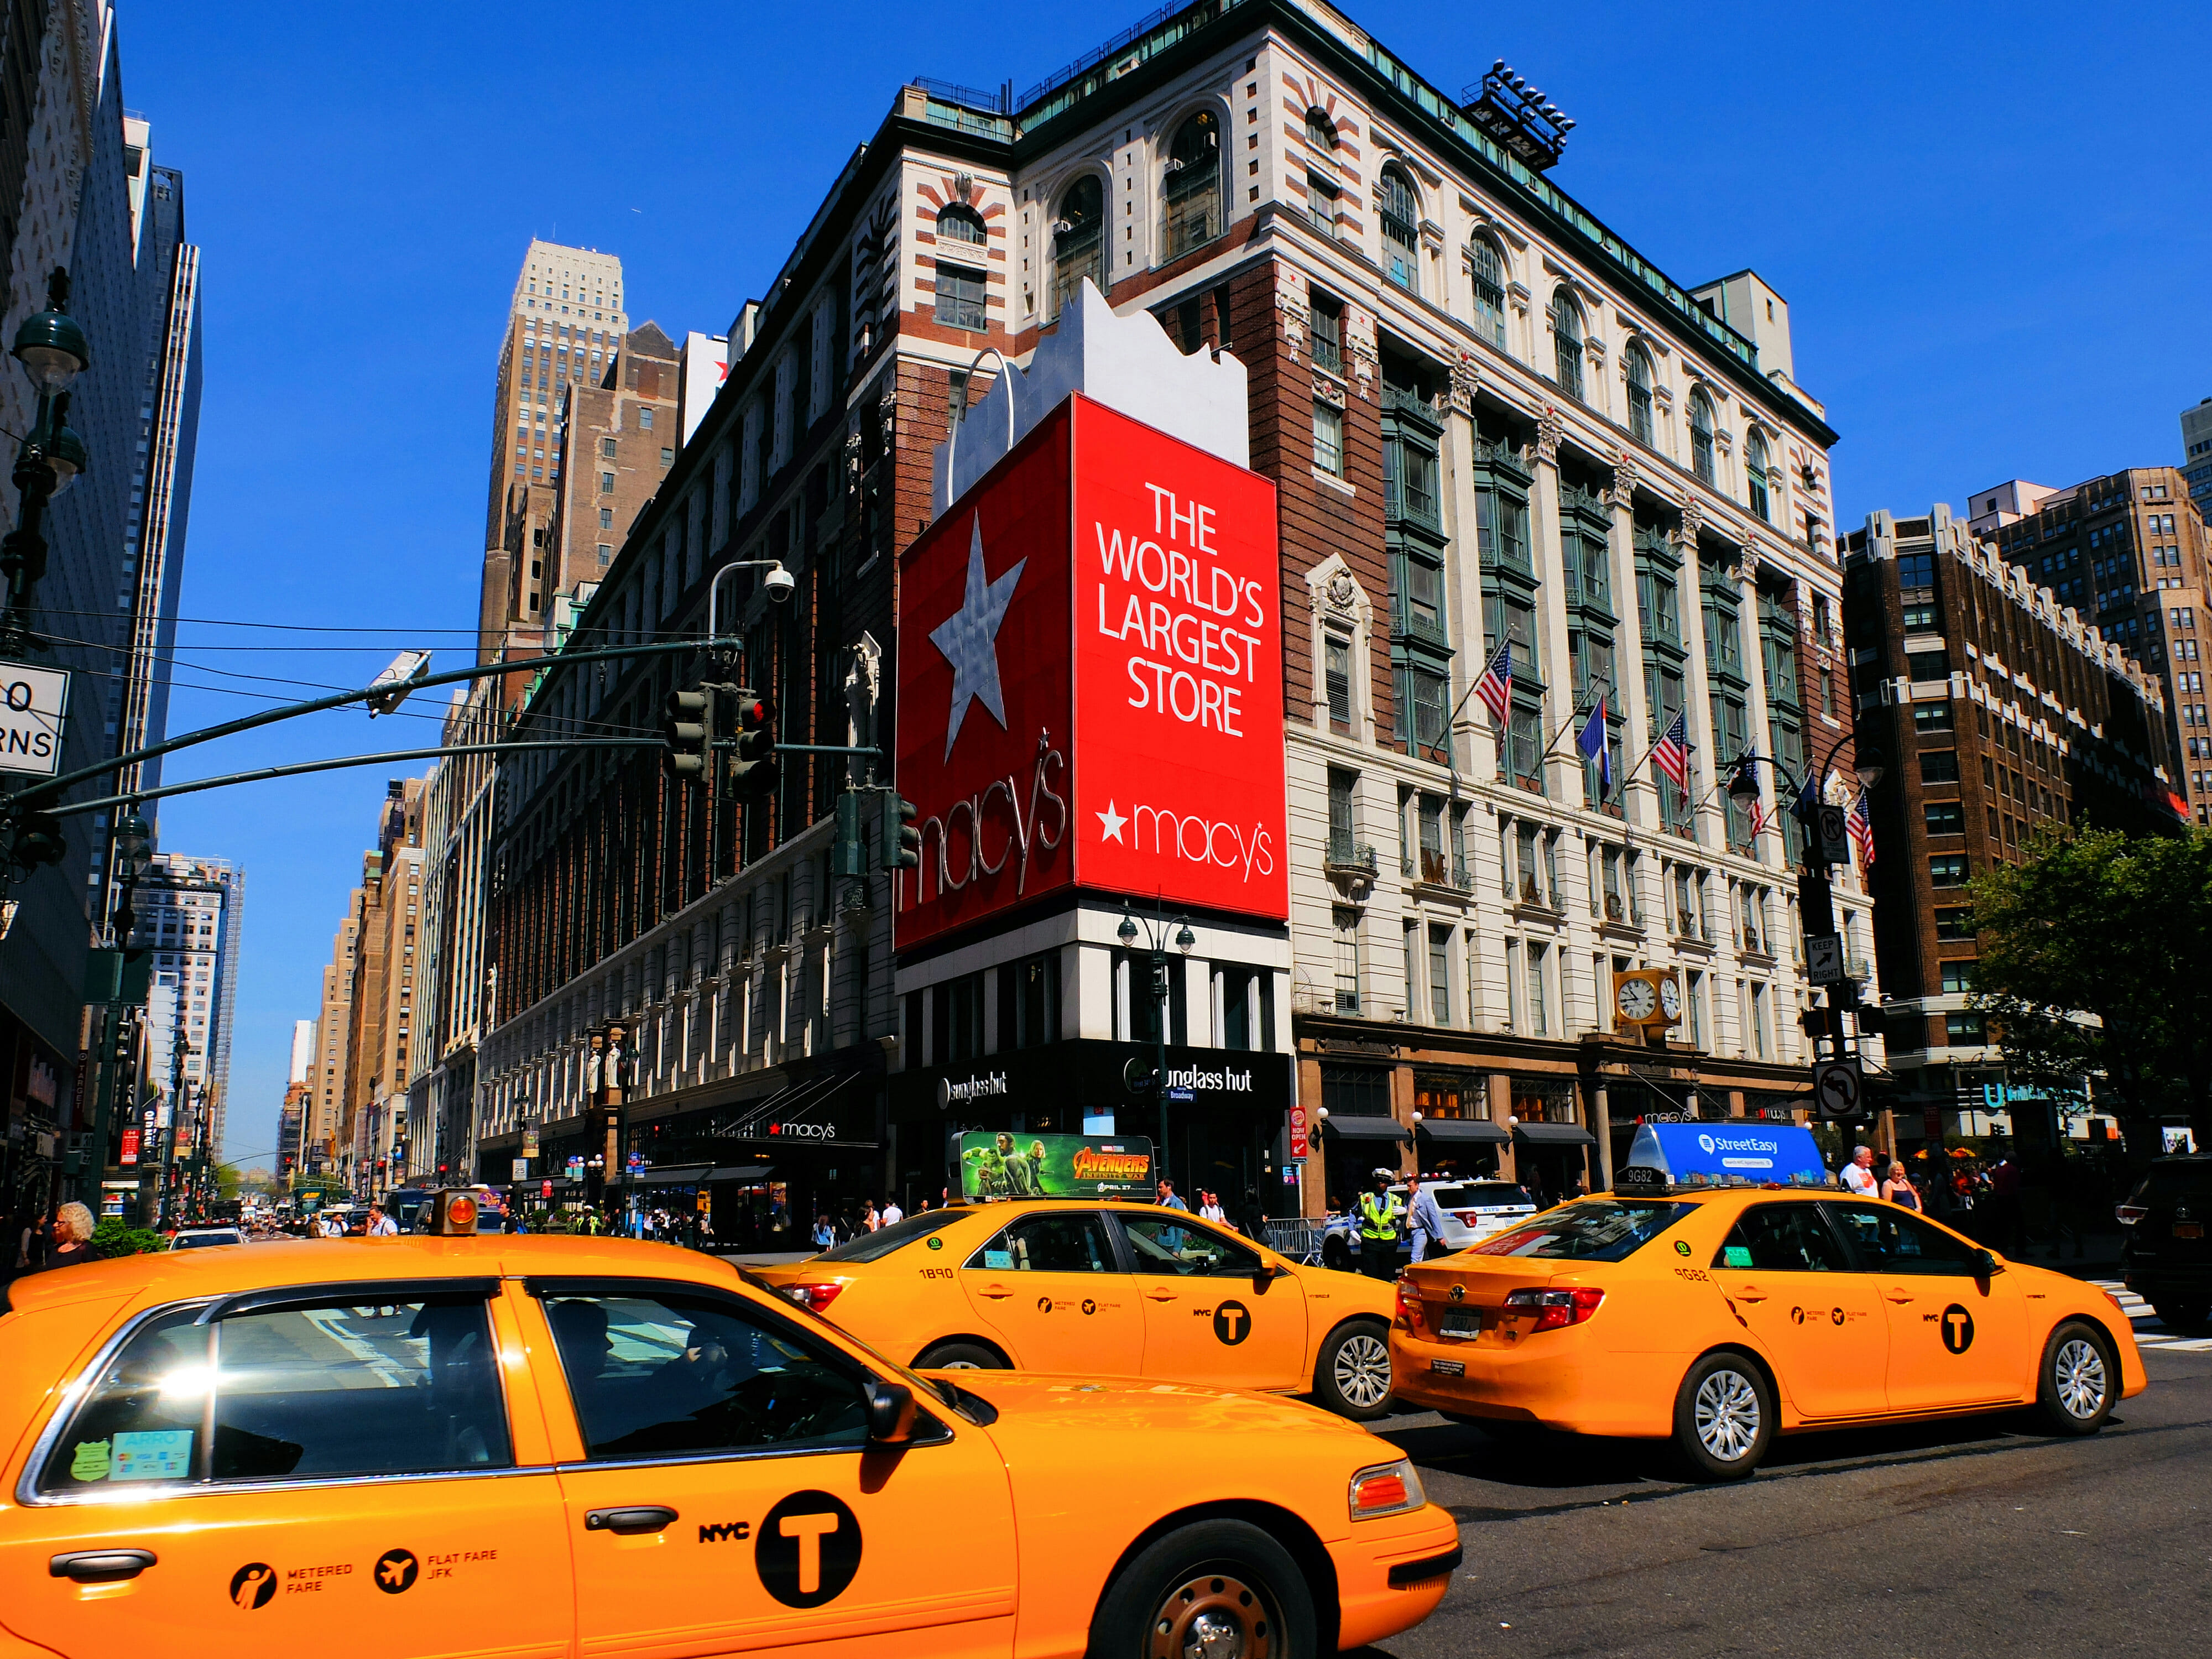 Macys in New York High Quality Wallpaper